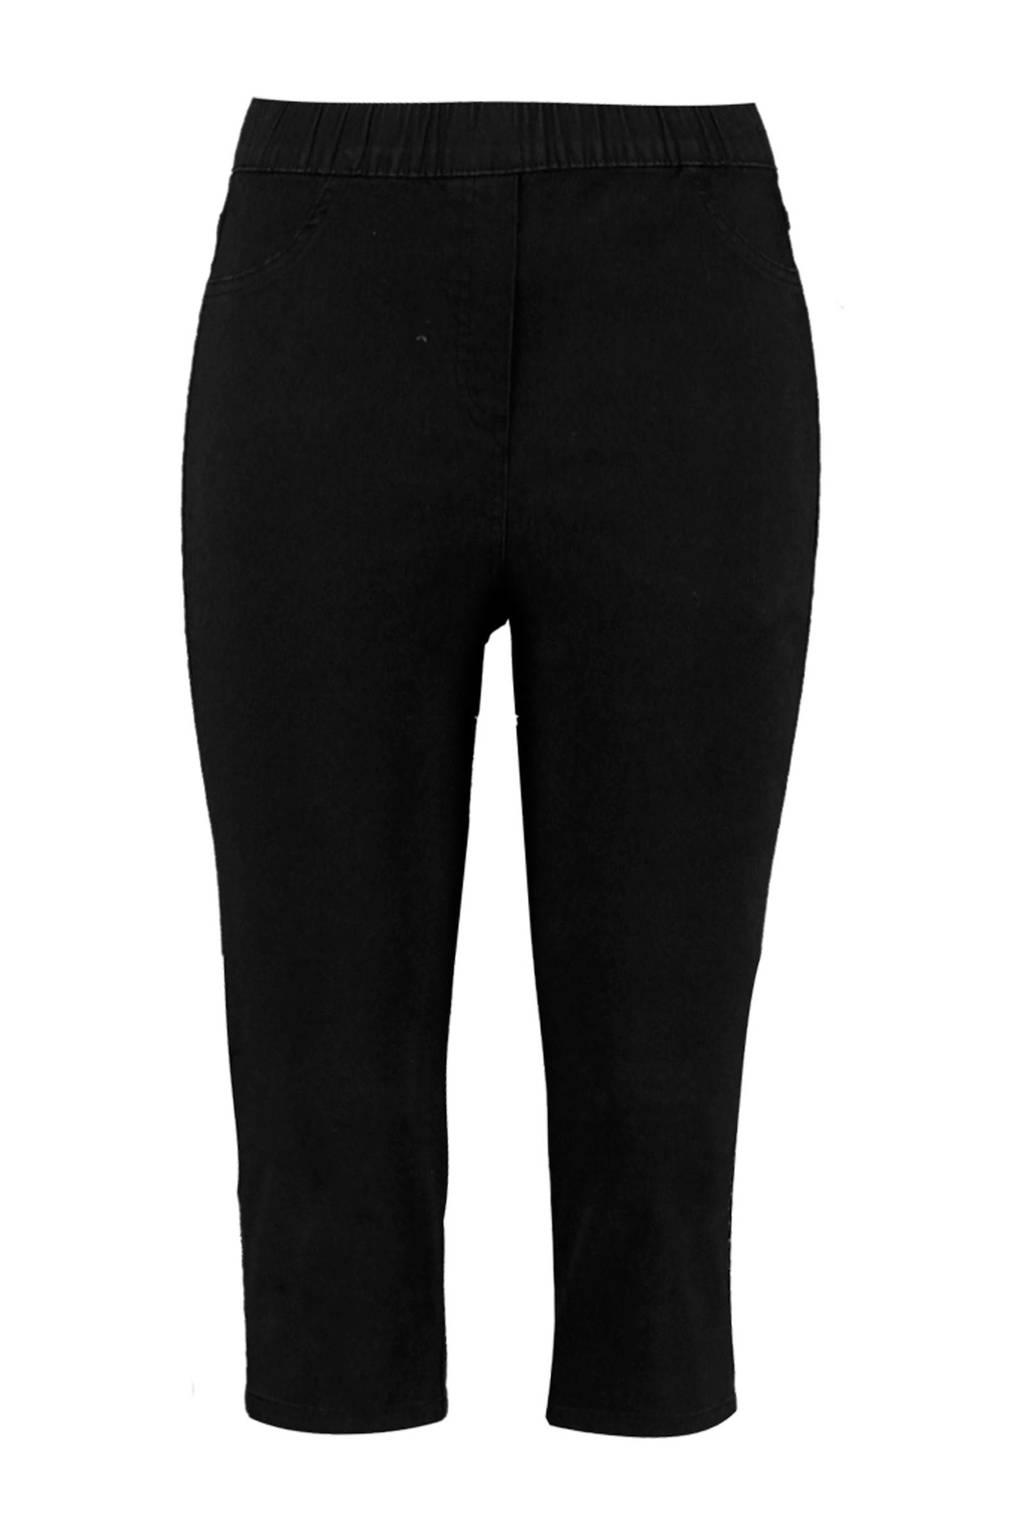 MS Mode high waist slim fit tregging zwart, Zwart